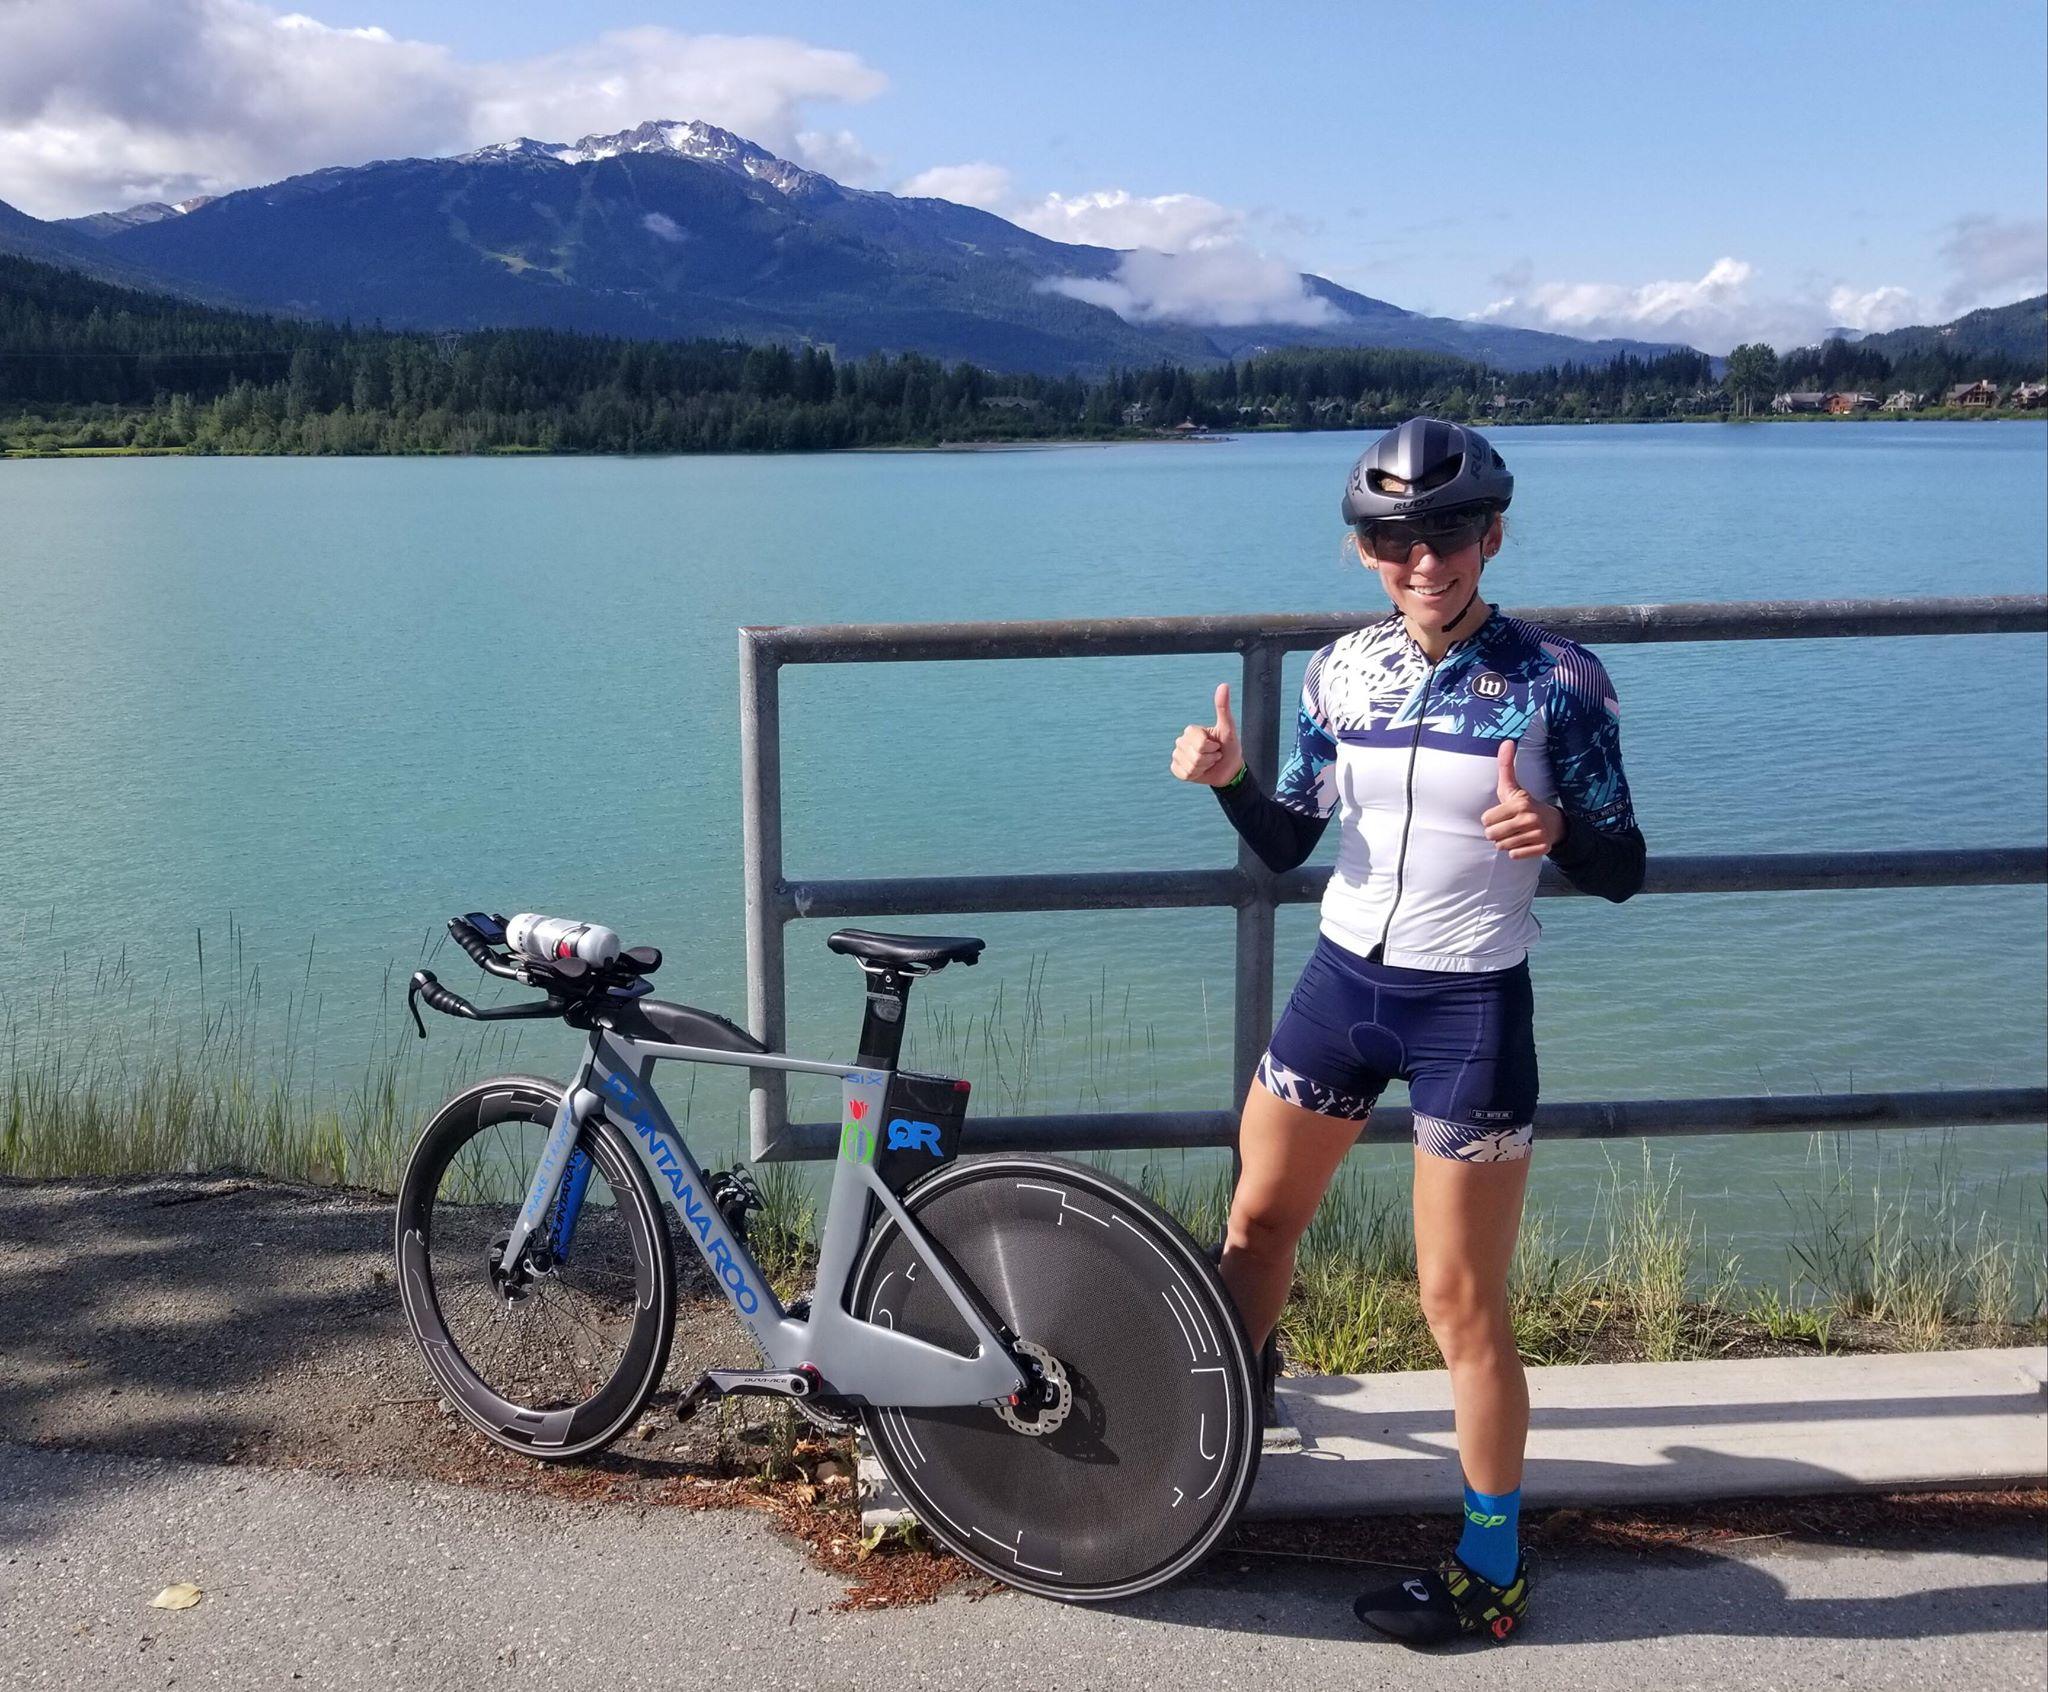 Coach_Terry_Wilson_Pursuit_of_The_Perfect_Race_IRONMAN_Canada_Jodie_Robertson_bike_Run_swim.jpg